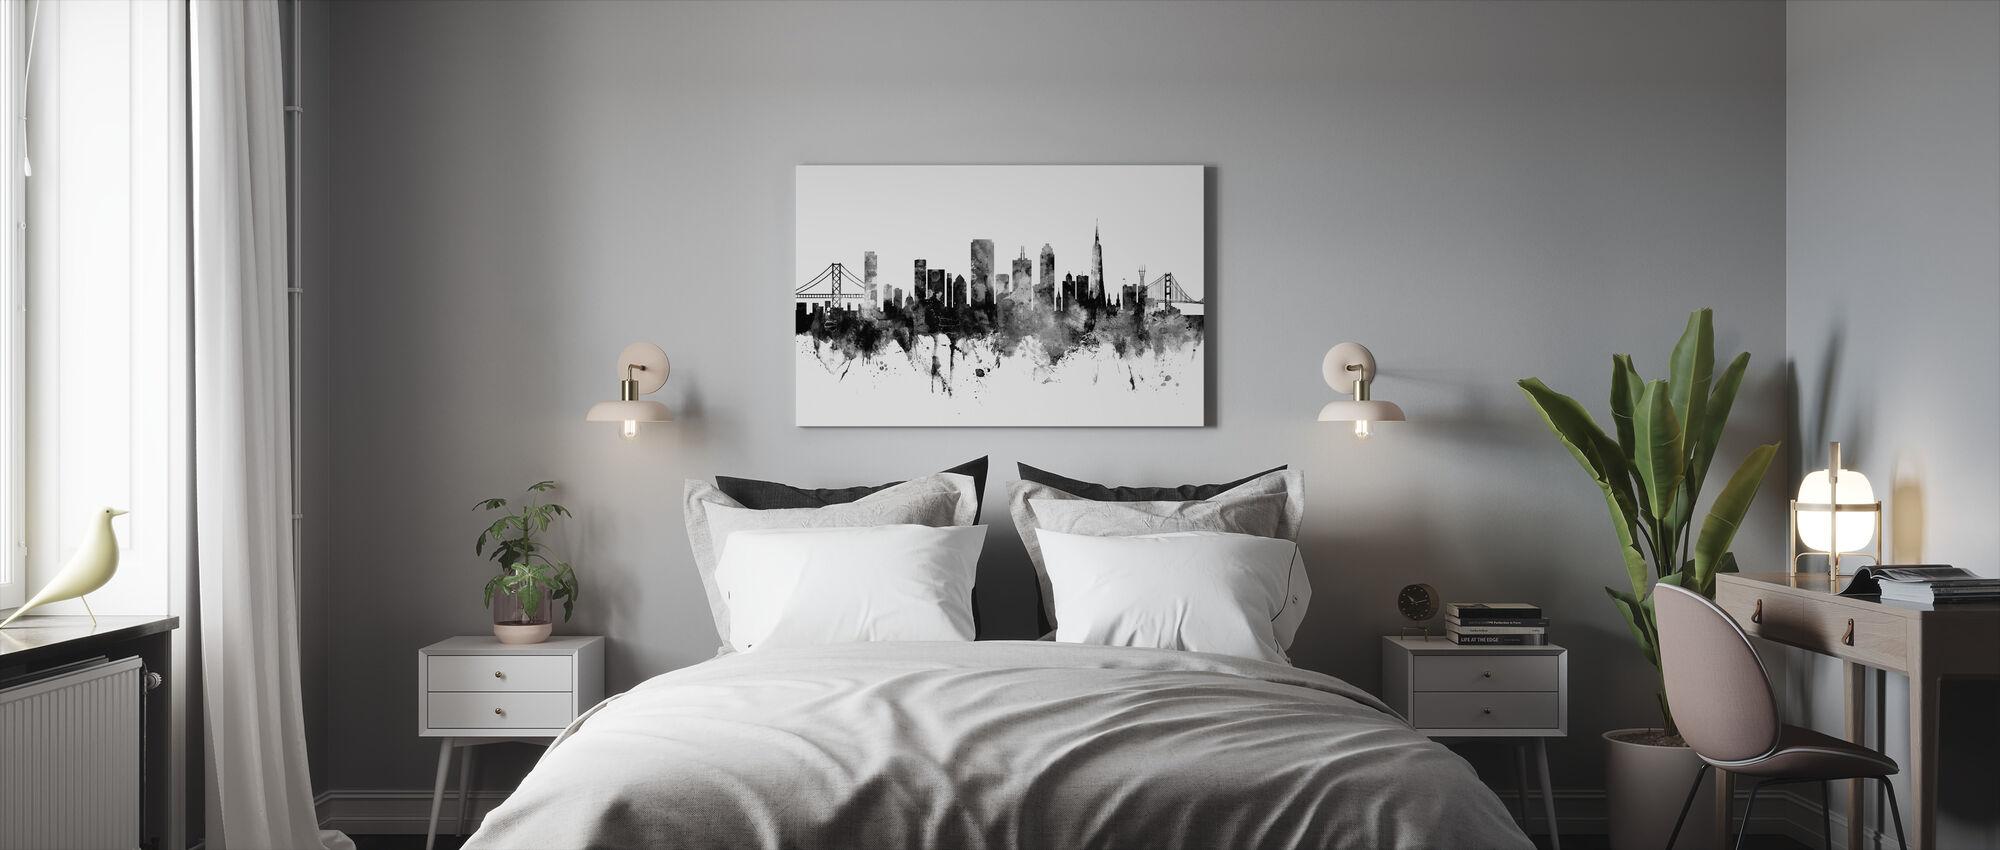 San Francisco City Skyline, black and white - Canvas print - Bedroom